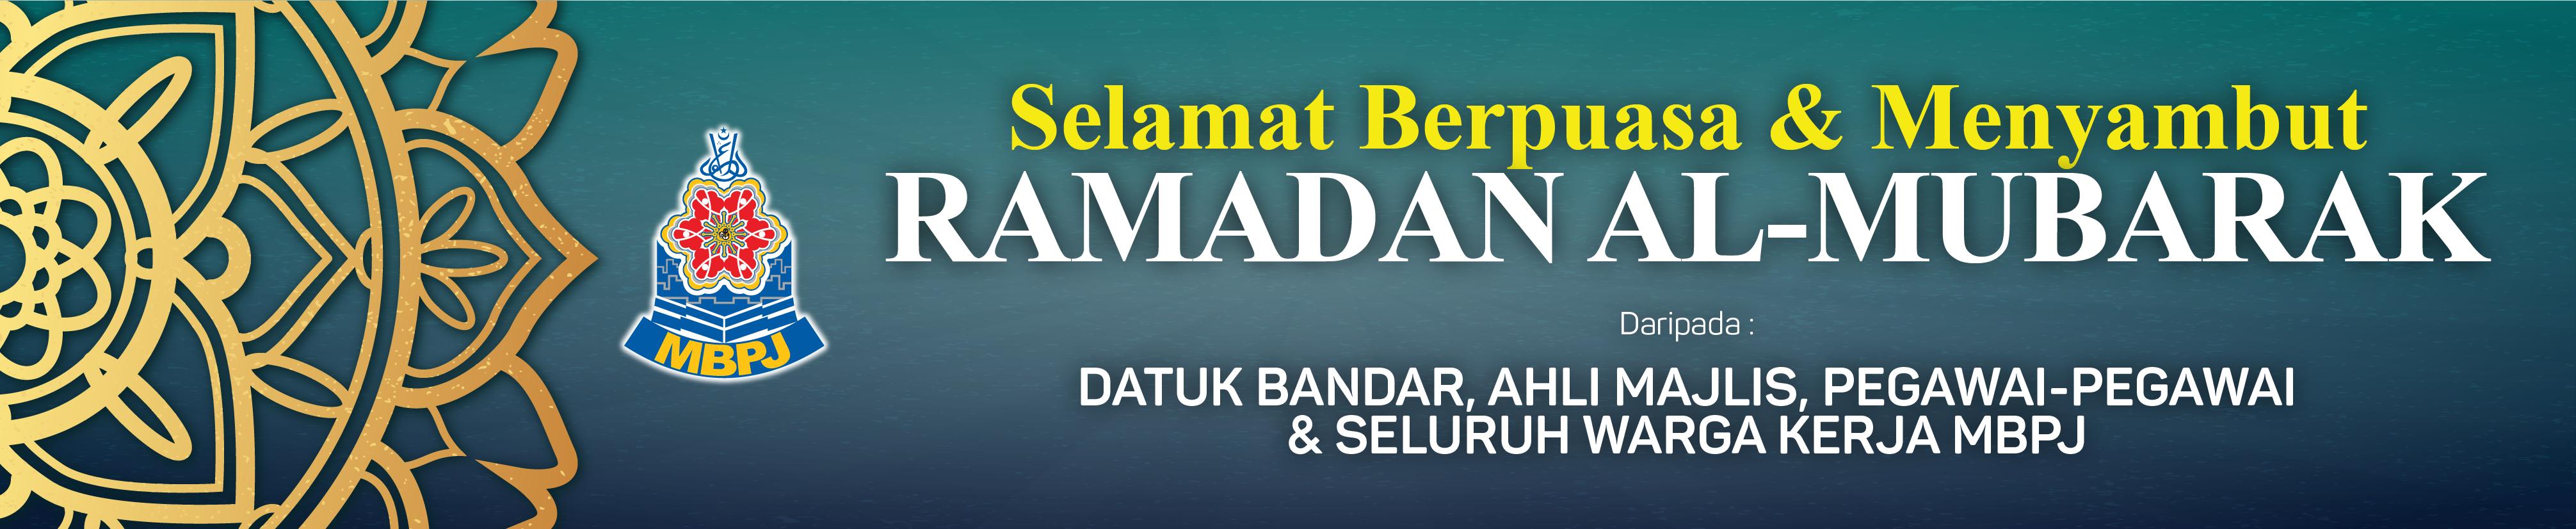 Banner Ramadan 2017